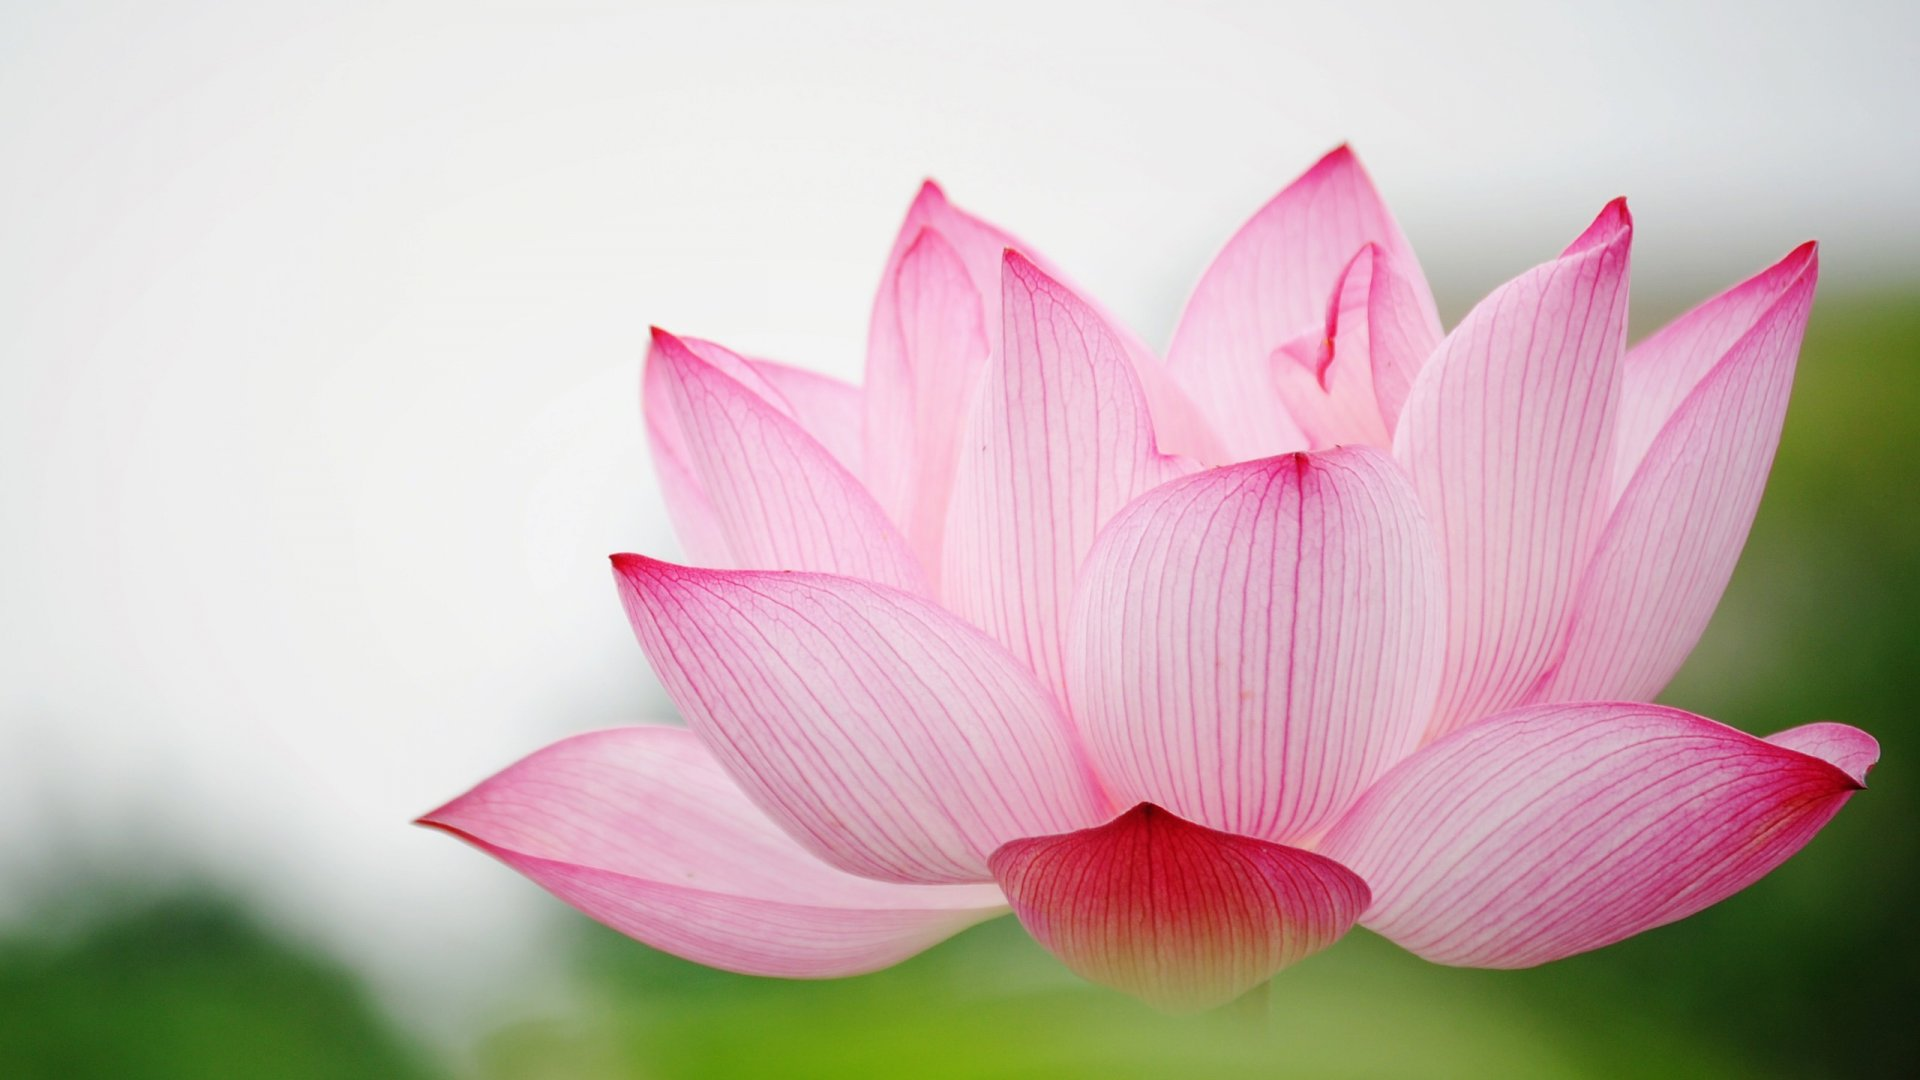 Thailands lotus lake a secret red flower galaxy connoisseurs thailands lotus lake a secret red flower galaxy izmirmasajfo